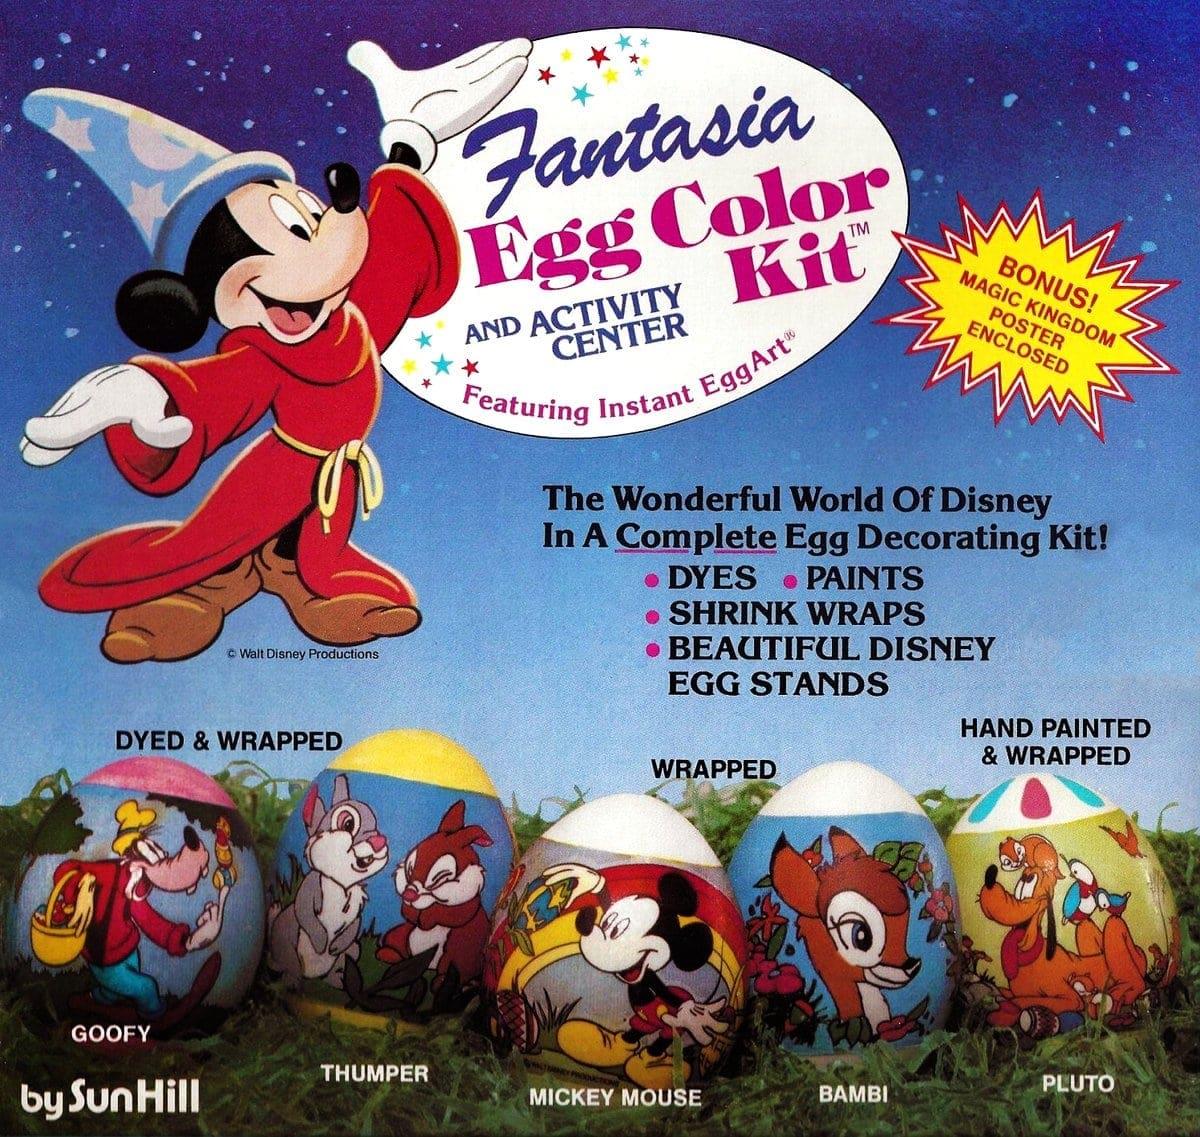 Vintage Disney Fantasia INSTANT EGGART Easter egg decorating kit